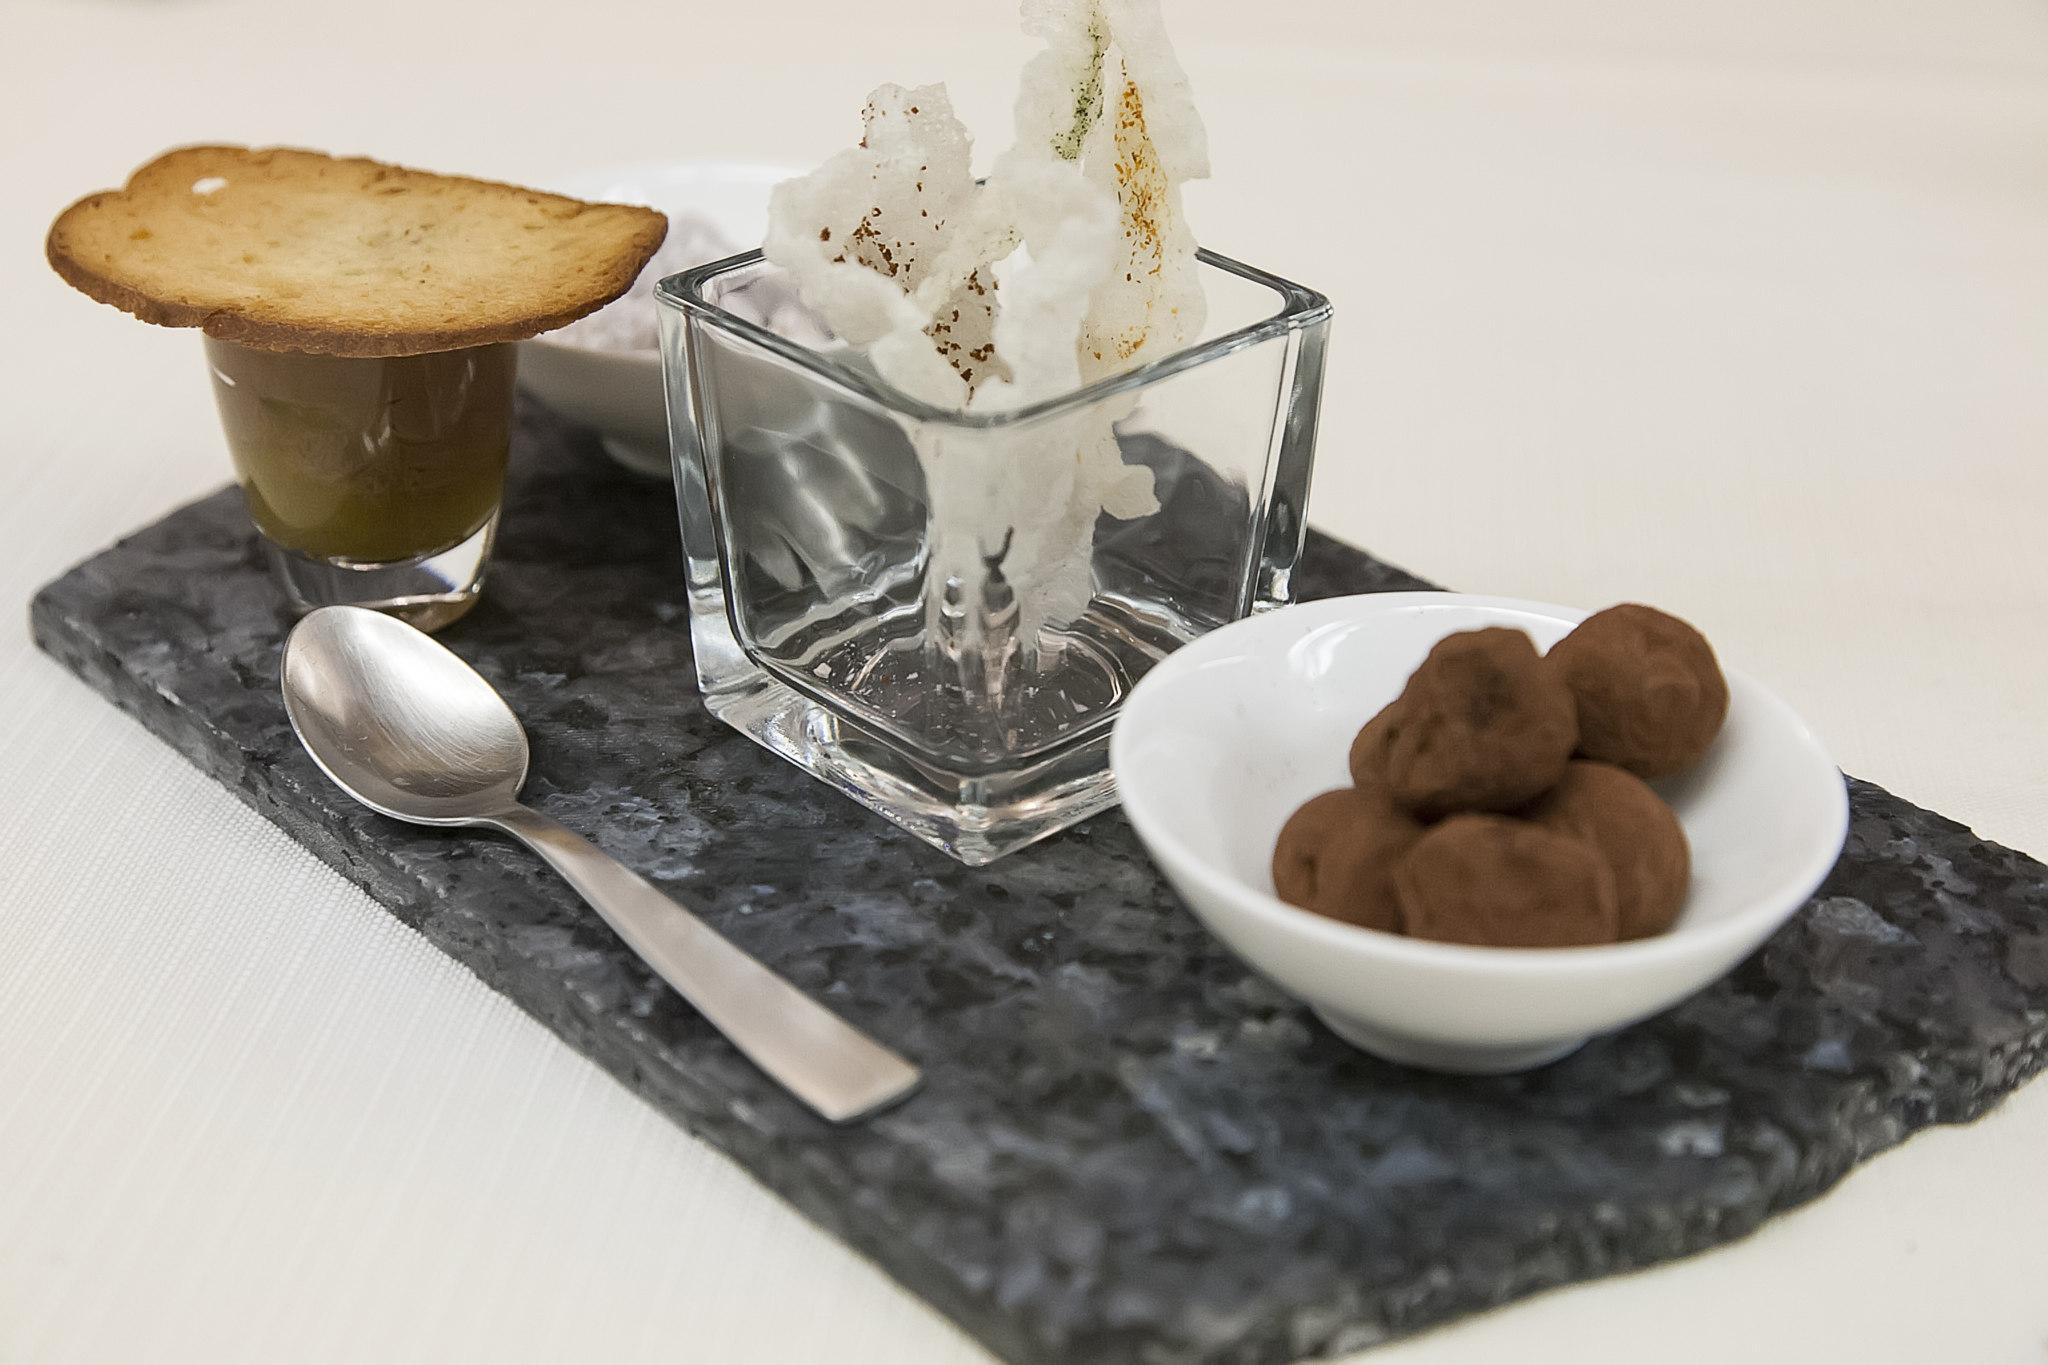 Delicatezze al cioccolato. food photography